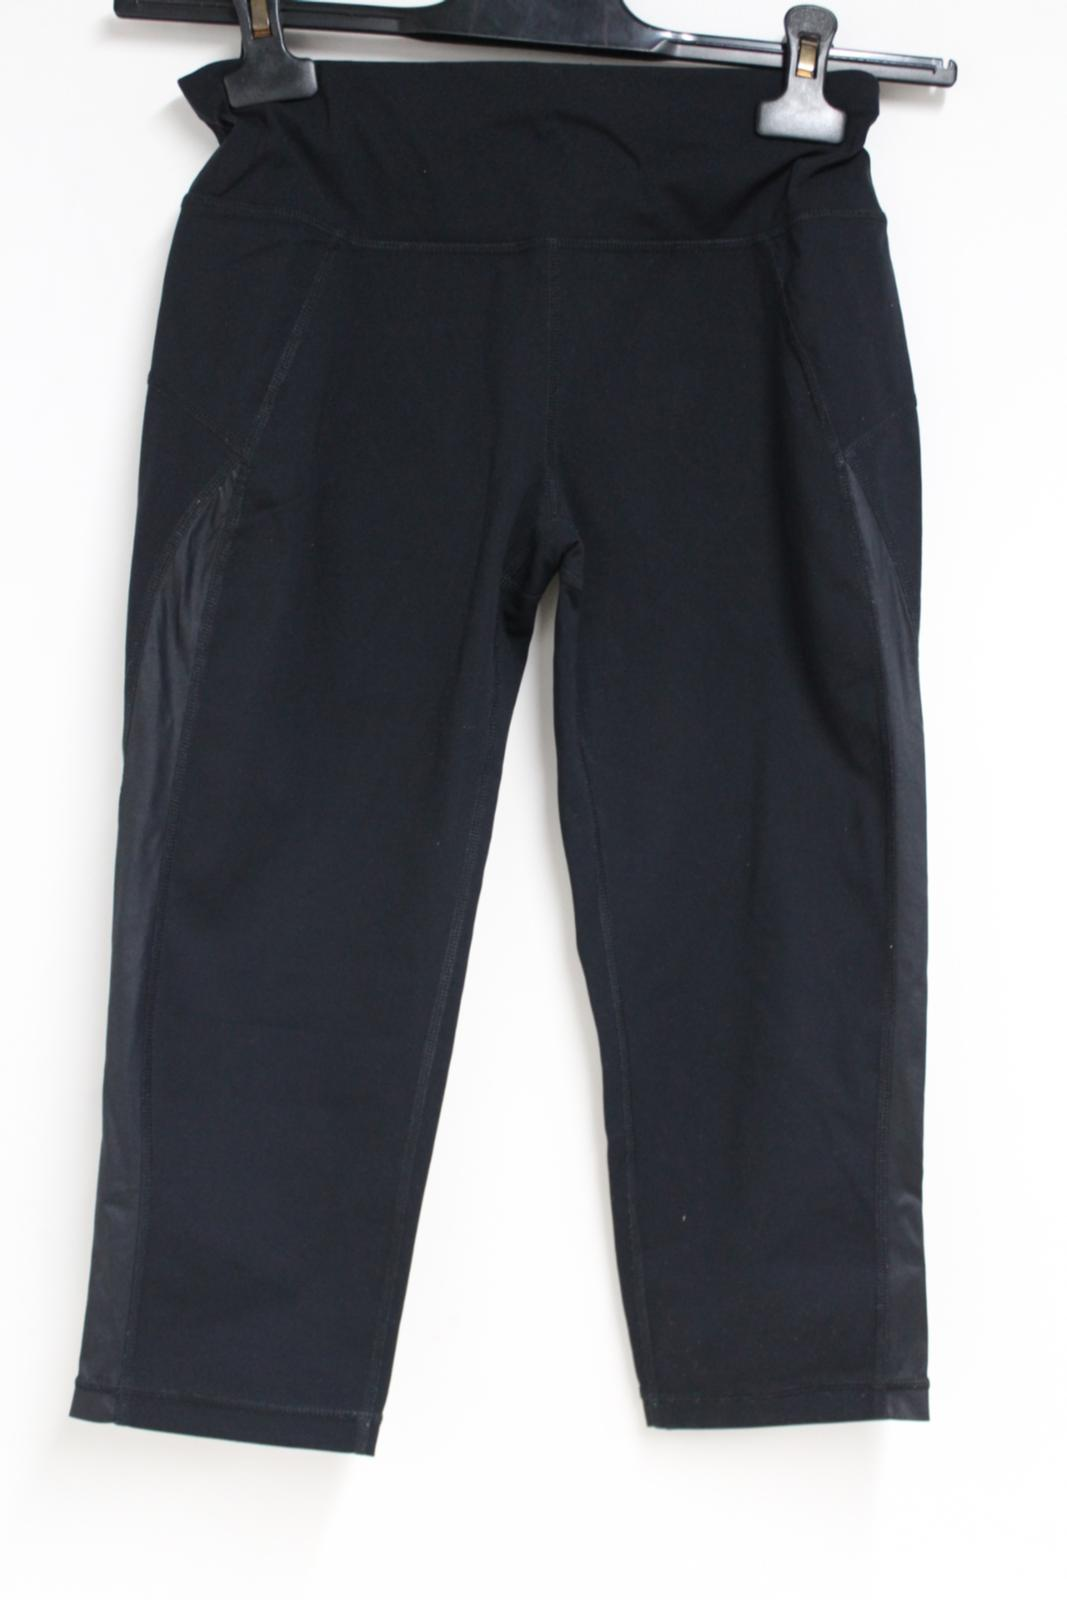 Sweaty-Betty-Ladies-Negro-3-4-piernas-Corto-Leggings-Activewear-pequeno-W26-L16 miniatura 2